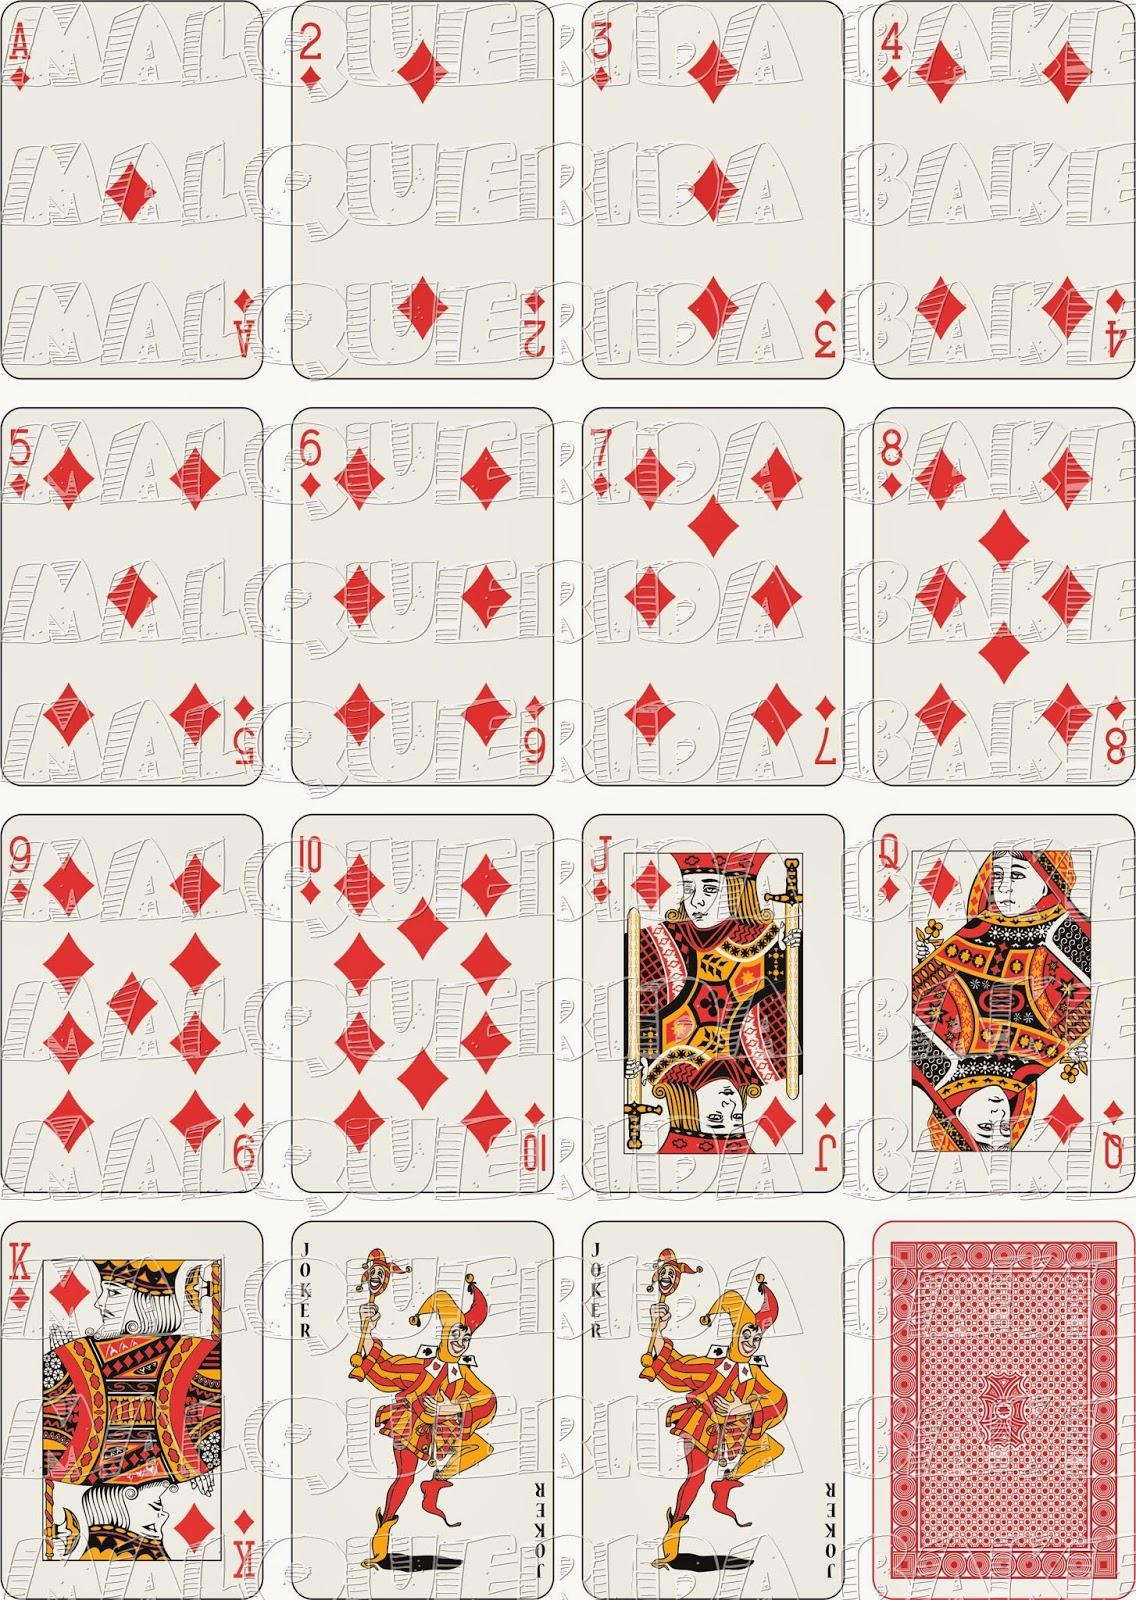 http://malqueridabakery.com/impresiones/987-poker-diamantes.html